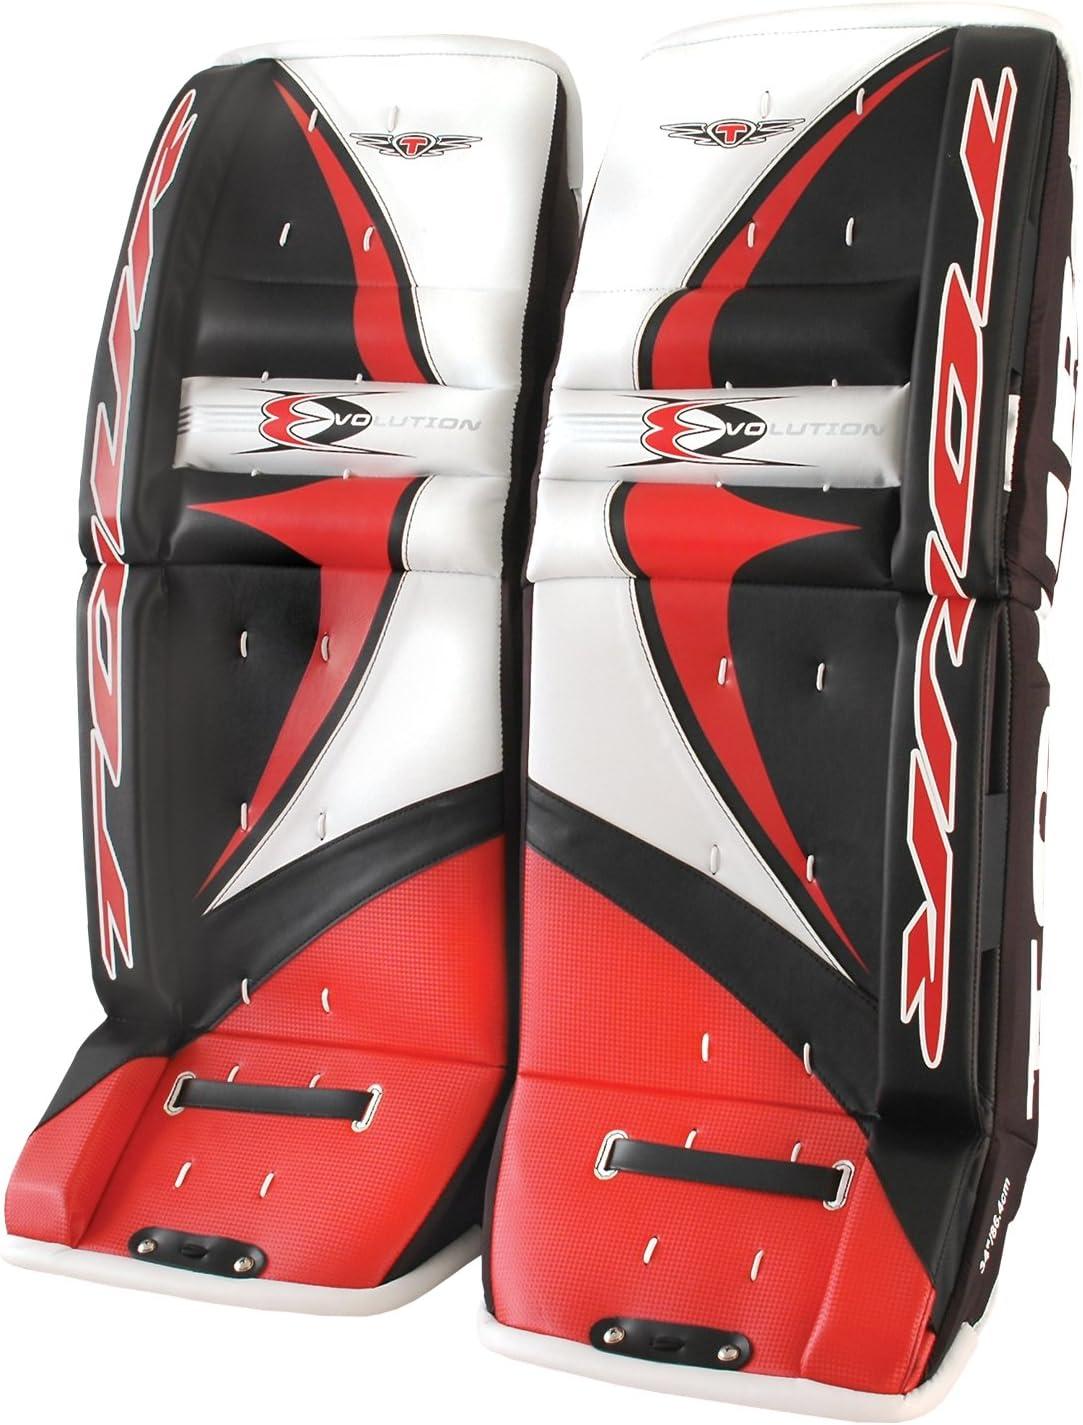 Tour Hockey Youth Evo 6000 Leg Pads (Size 27) : Baseball Leg Guards : Sports & Outdoors